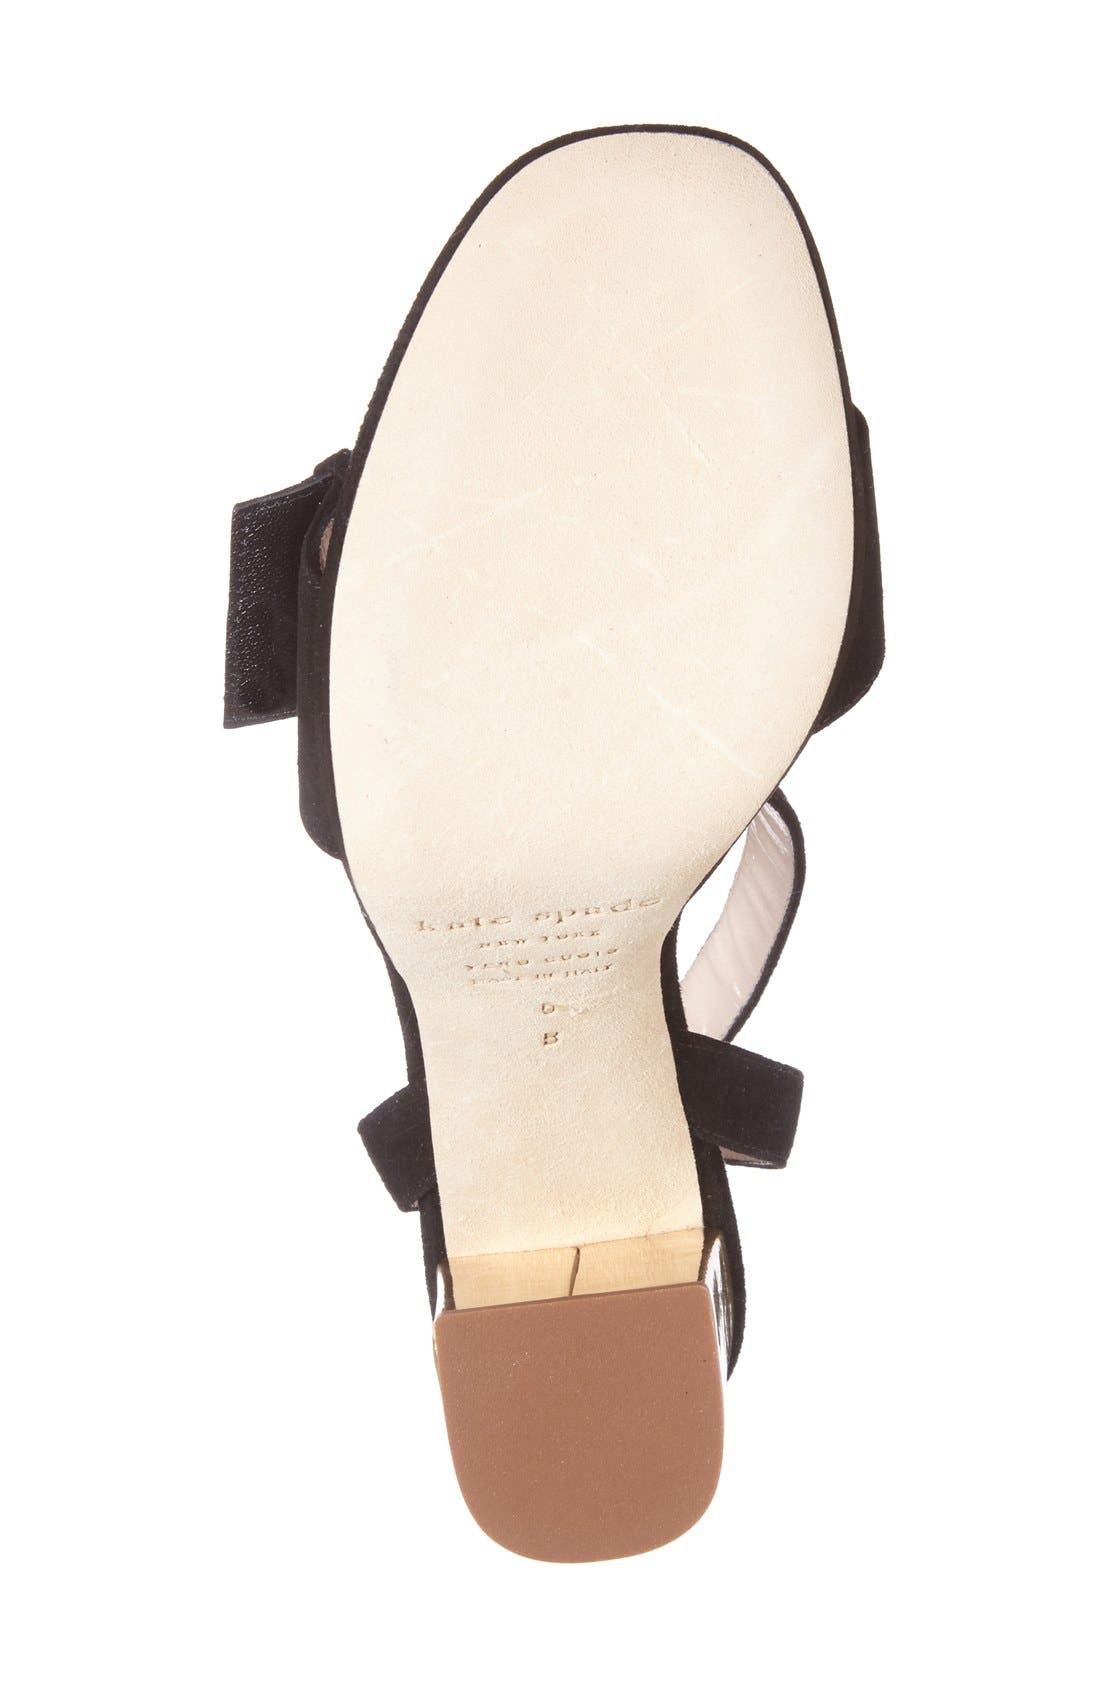 Alternate Image 2  - kate spade new york 'breeze' sandal (Women)